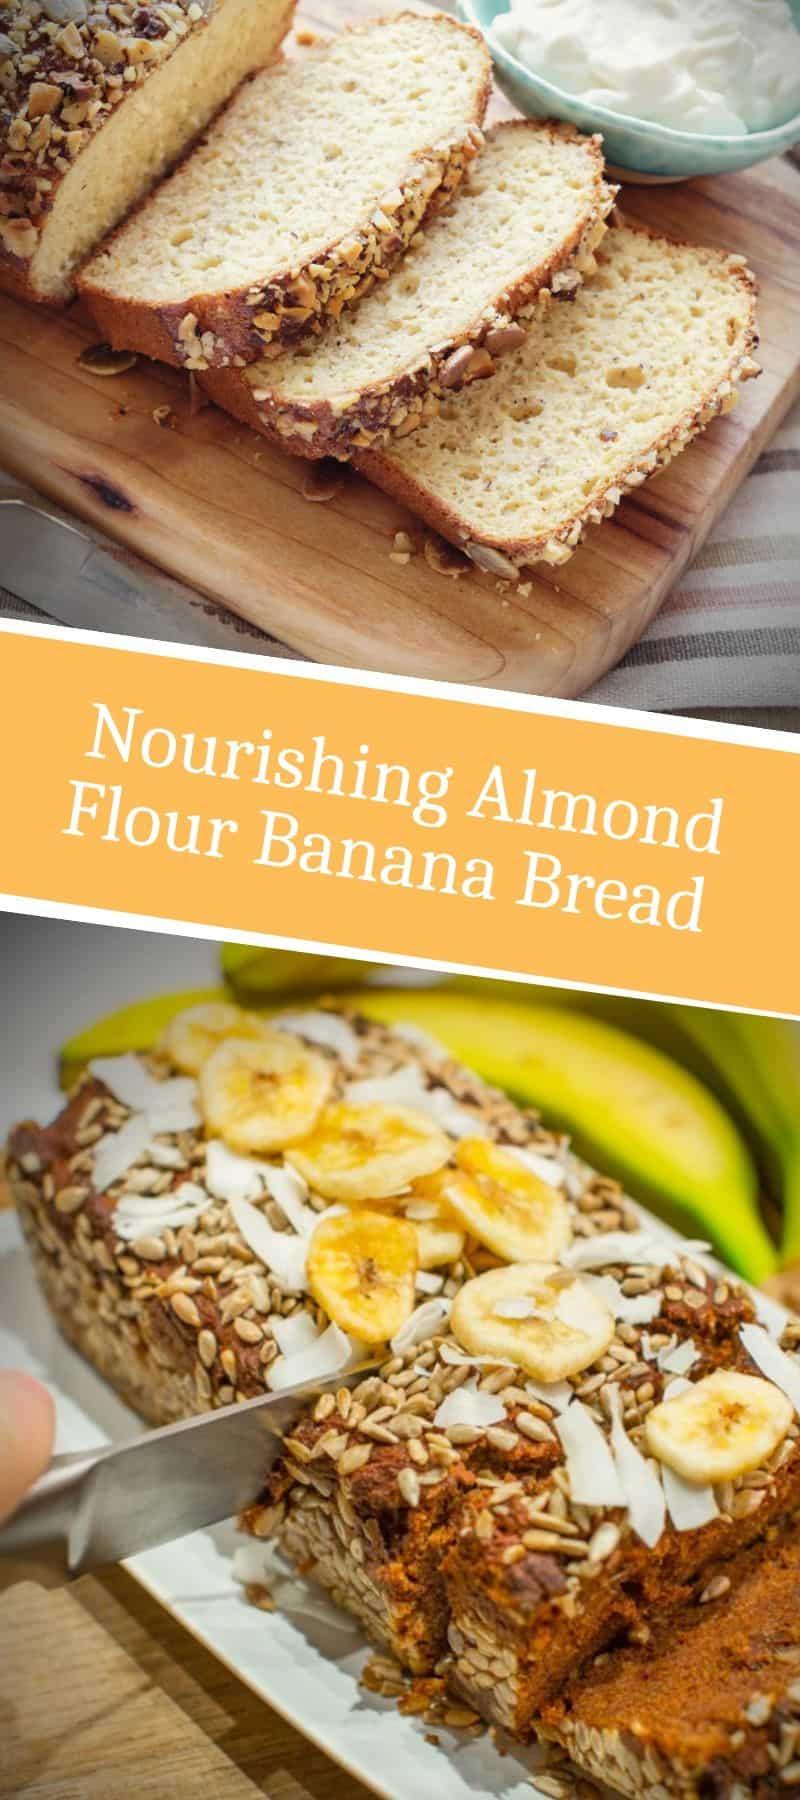 Nourishing Almond Flour Banana Bread Recipe 3